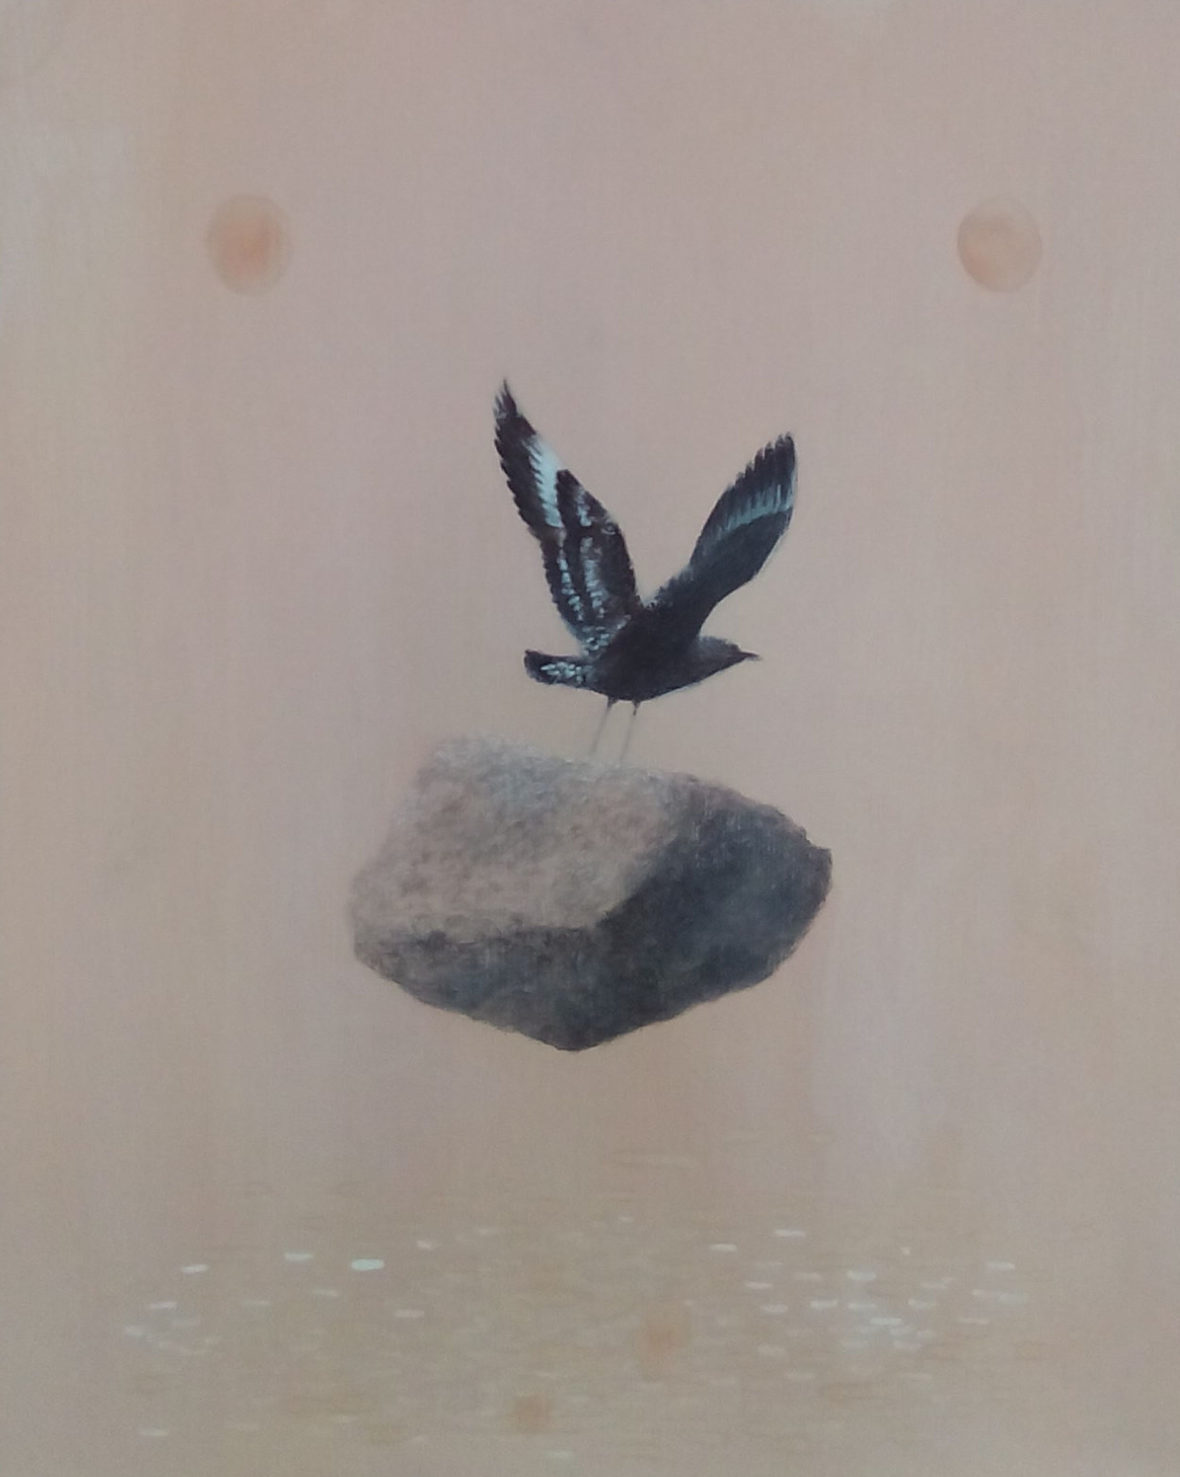 Merkillisen vahva lintu